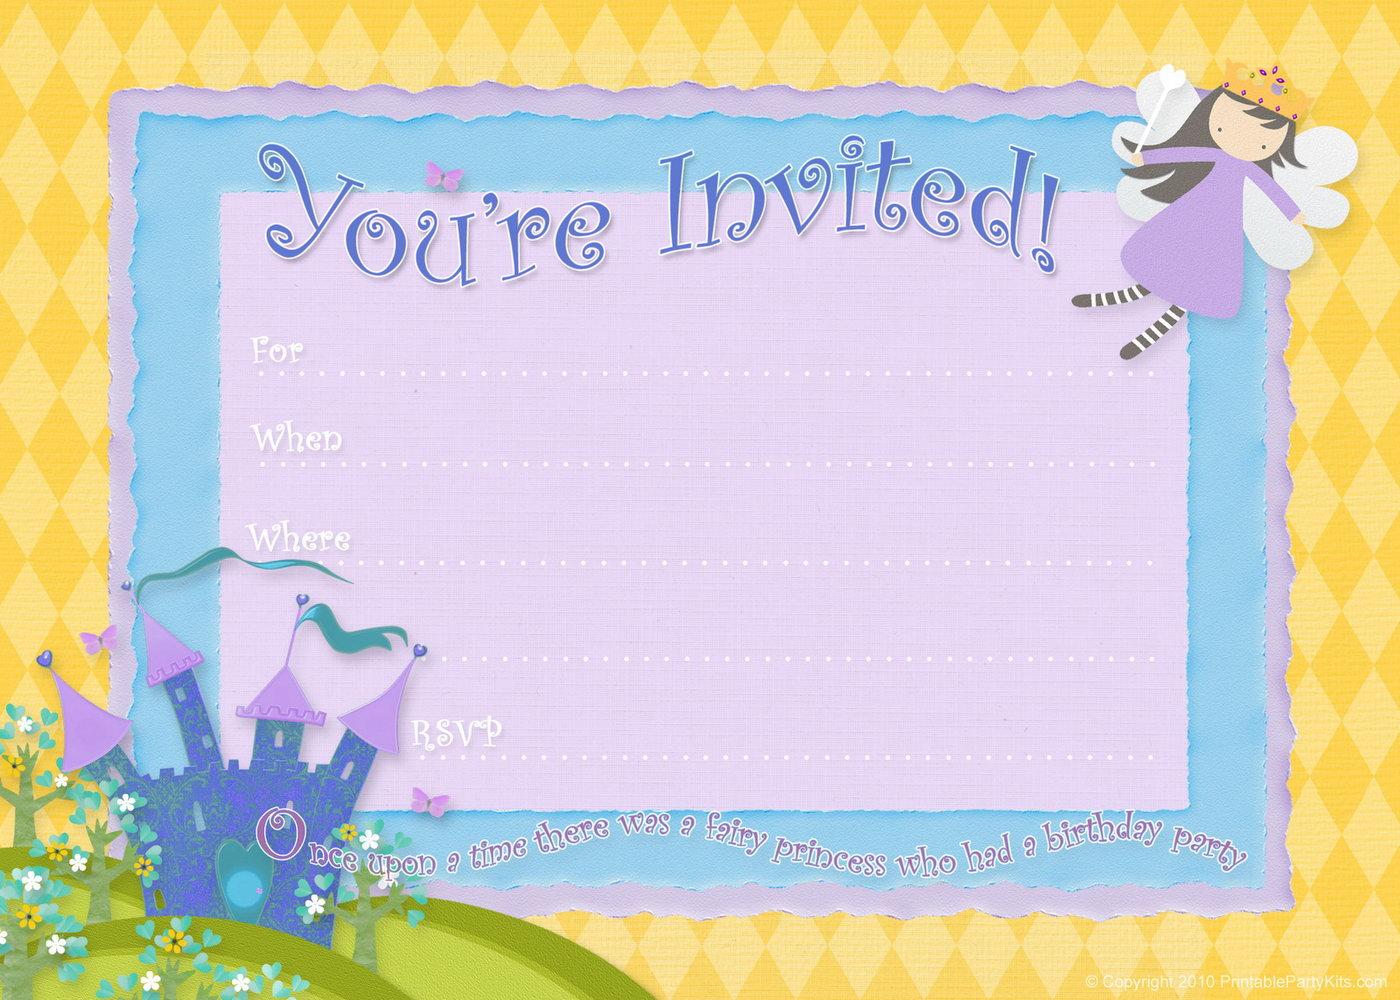 Downloadable Free Invitation Templates